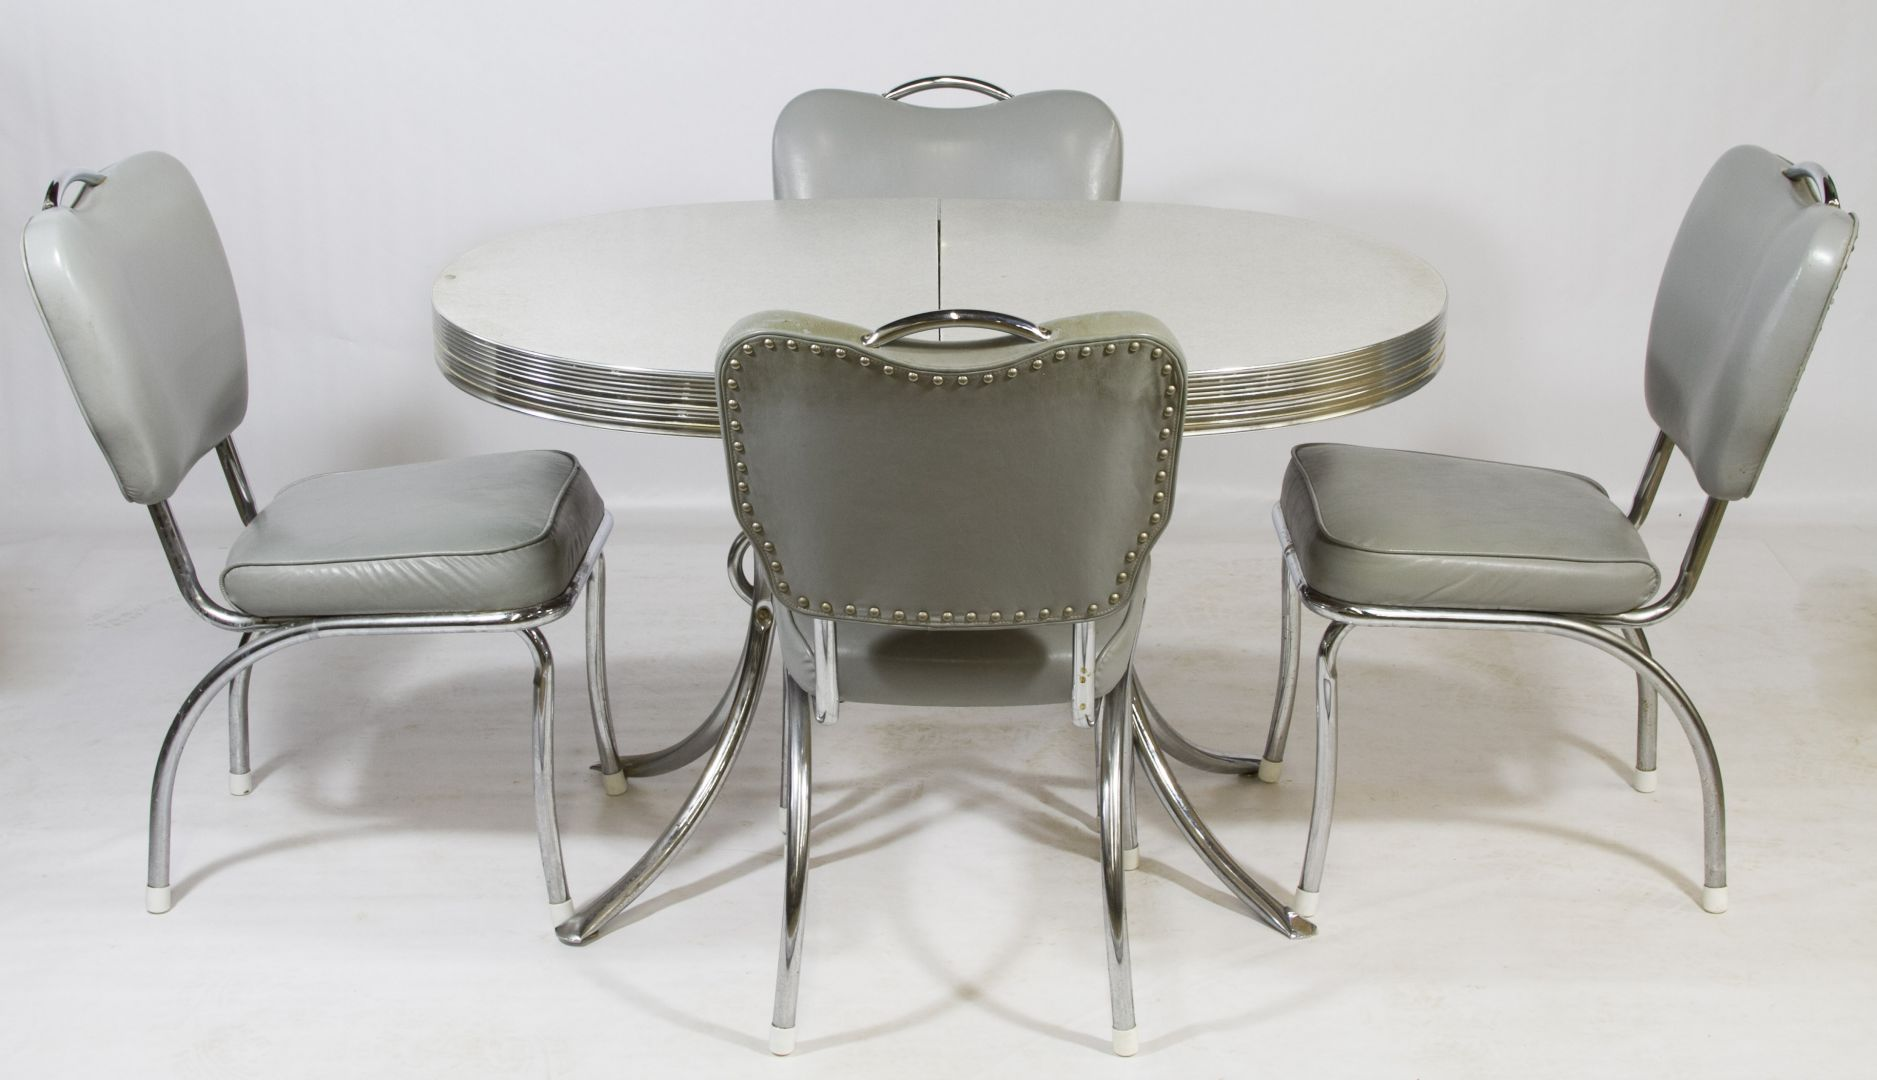 Mid Century Modern Chrome Kitchen Set By Daystrom For Ladd Furniture